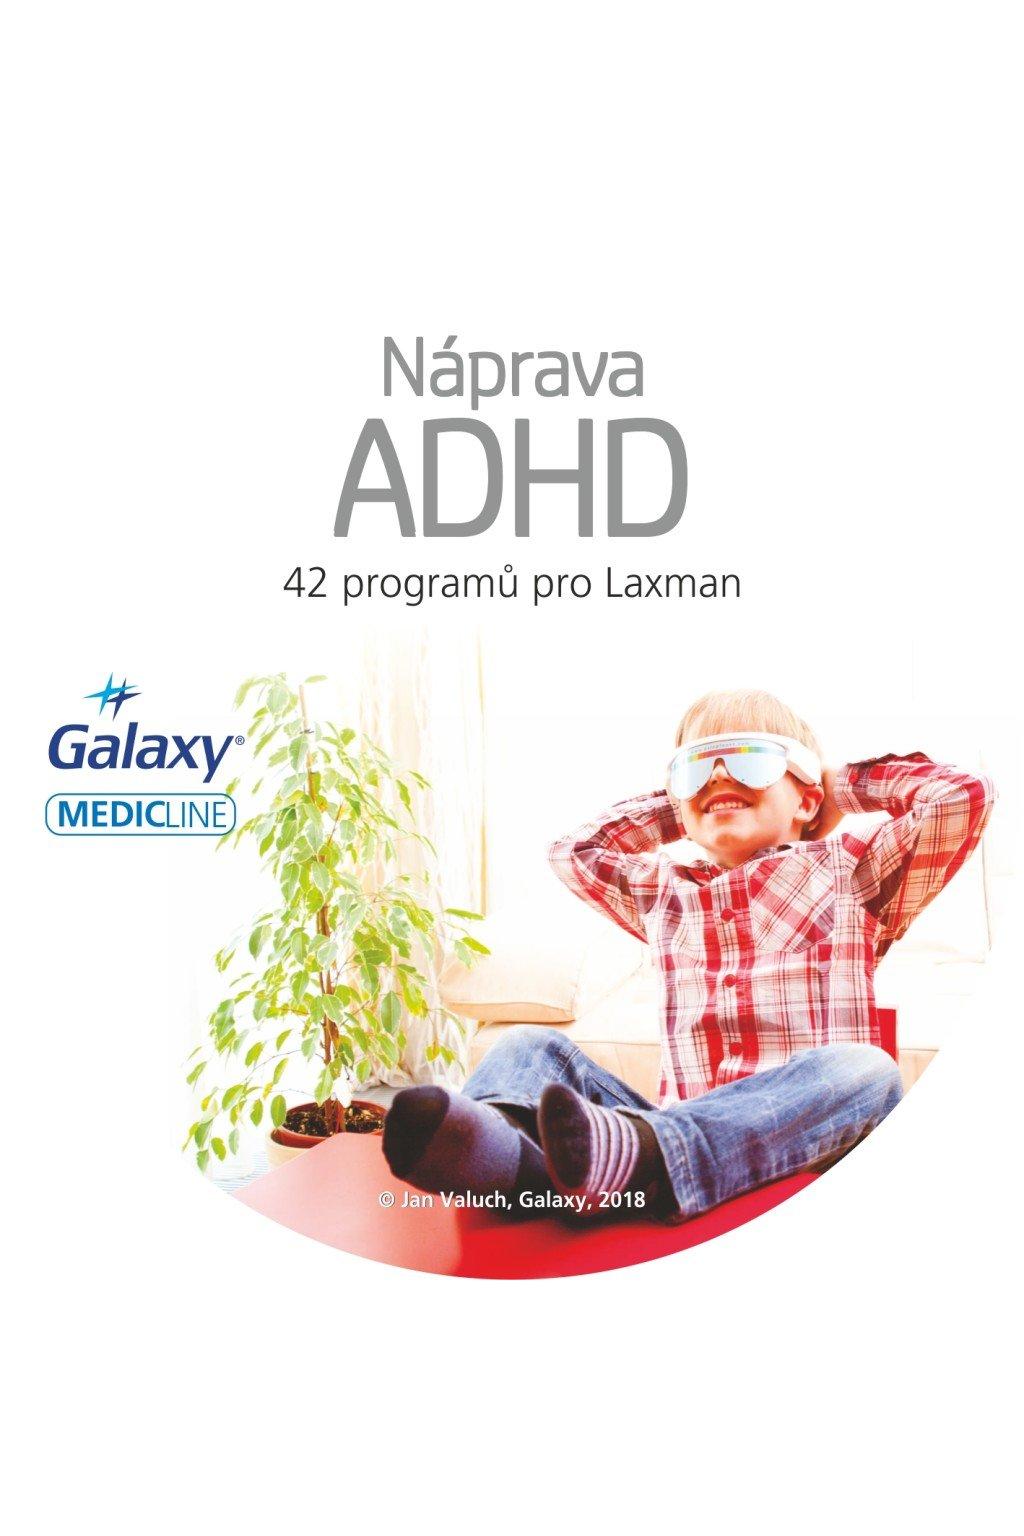 533 naprava adhd sada programu pro avs pristroj laxman a relaxman